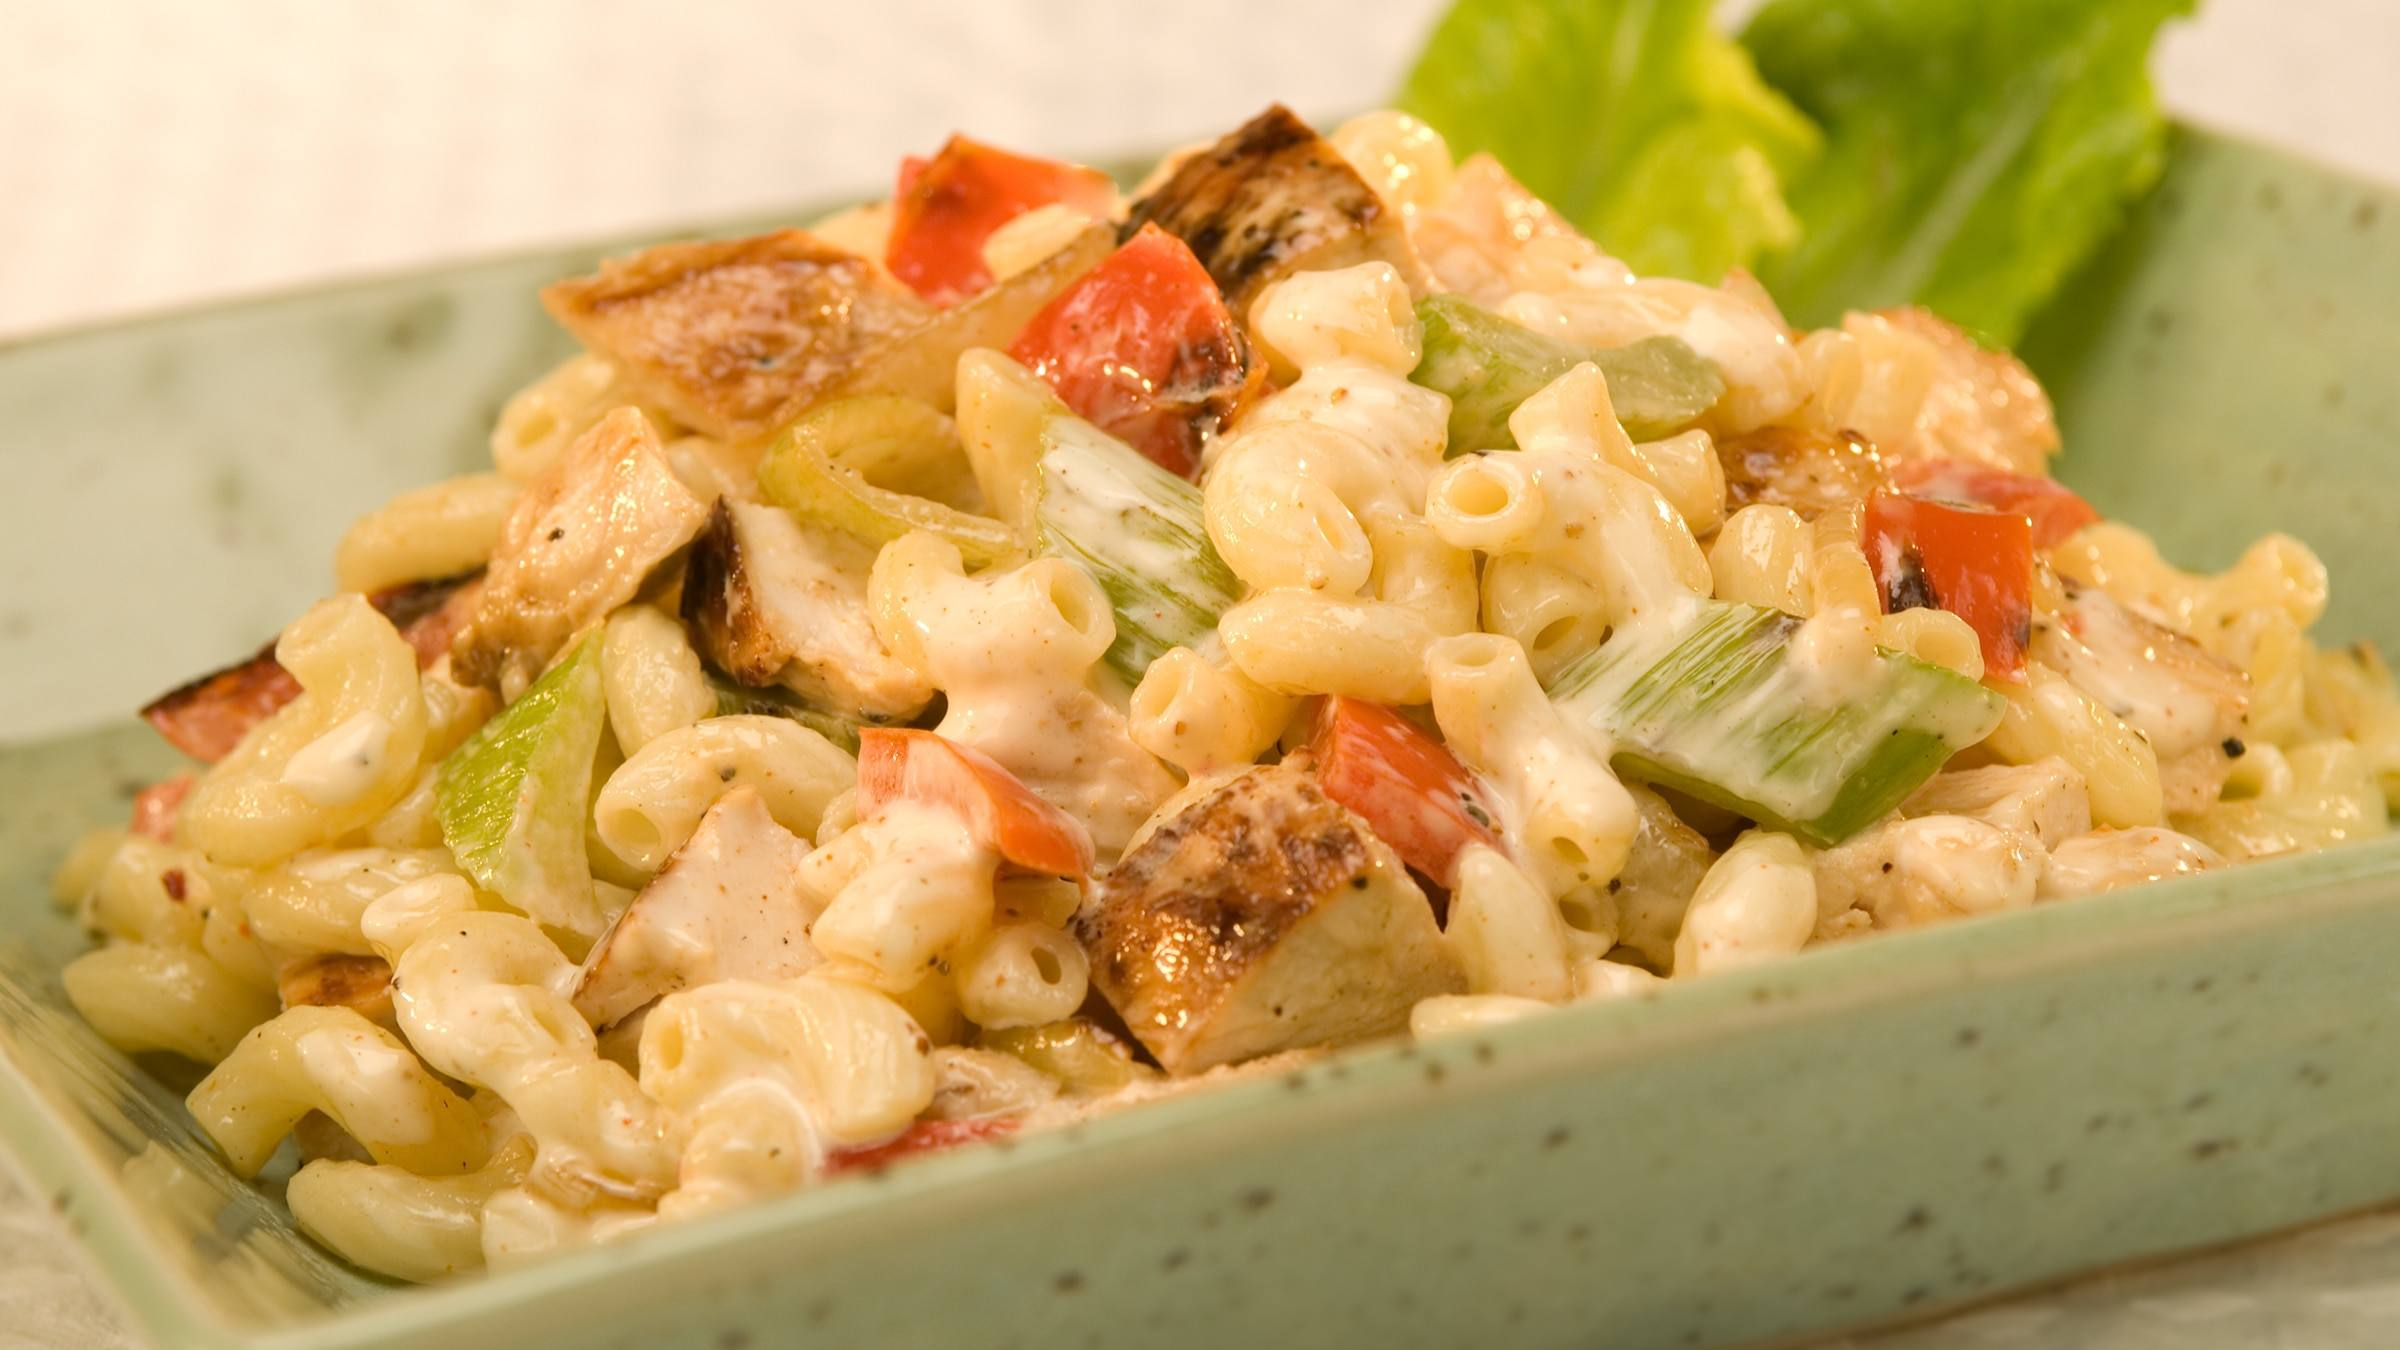 Grilled Chicken Macaroni Salad